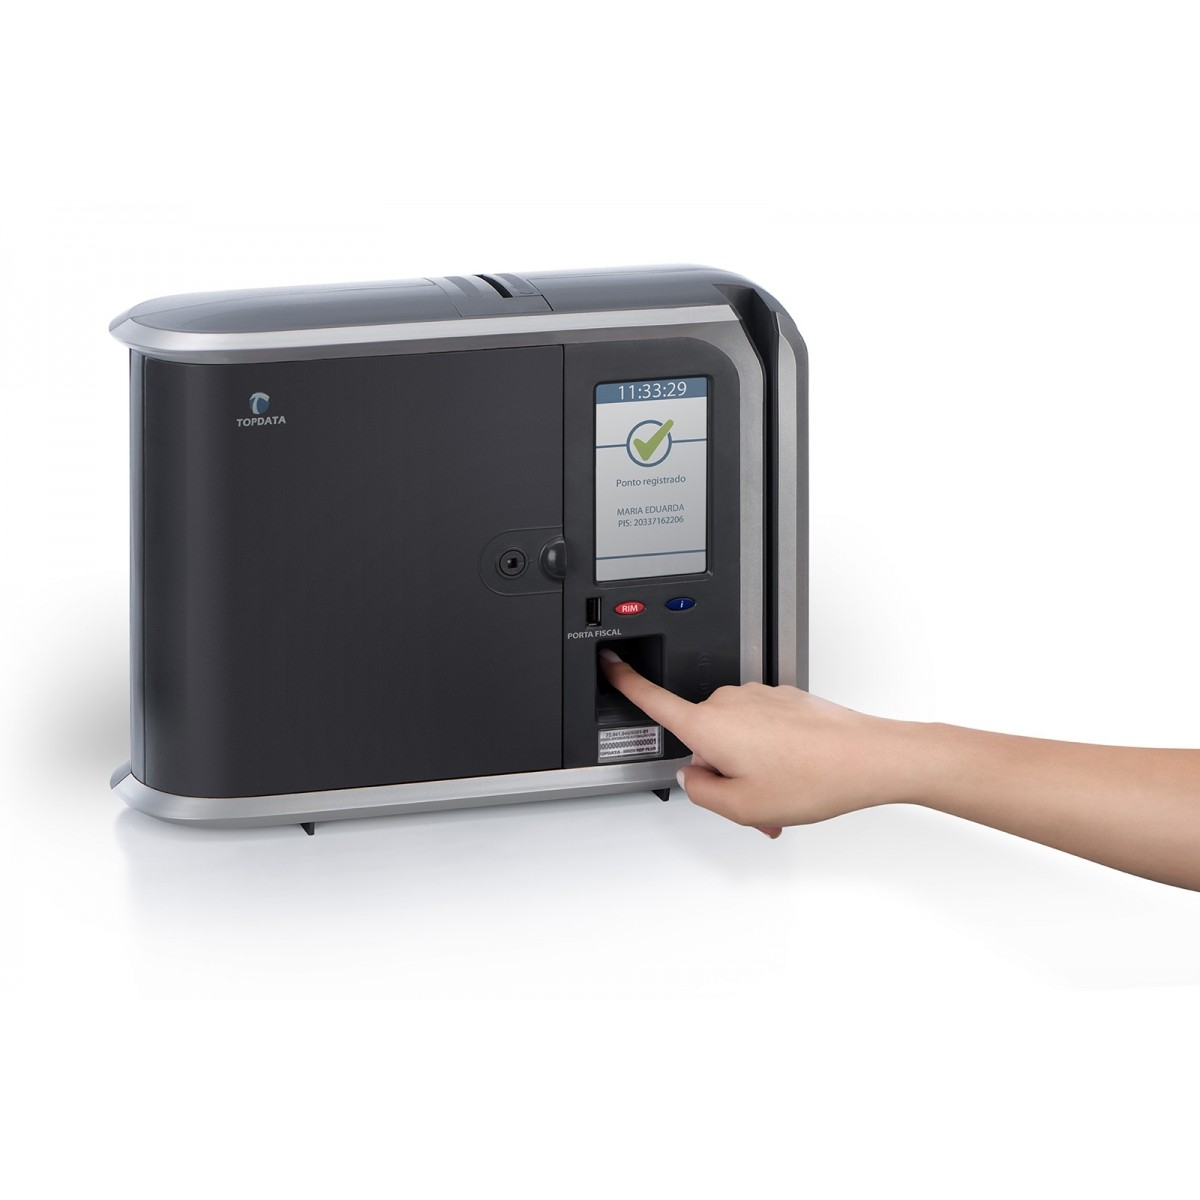 Relógio de Ponto Inner Rep Plus Bio Prox LFD Topdata + Ponto Secullum 4  - Iponto Tecnologia